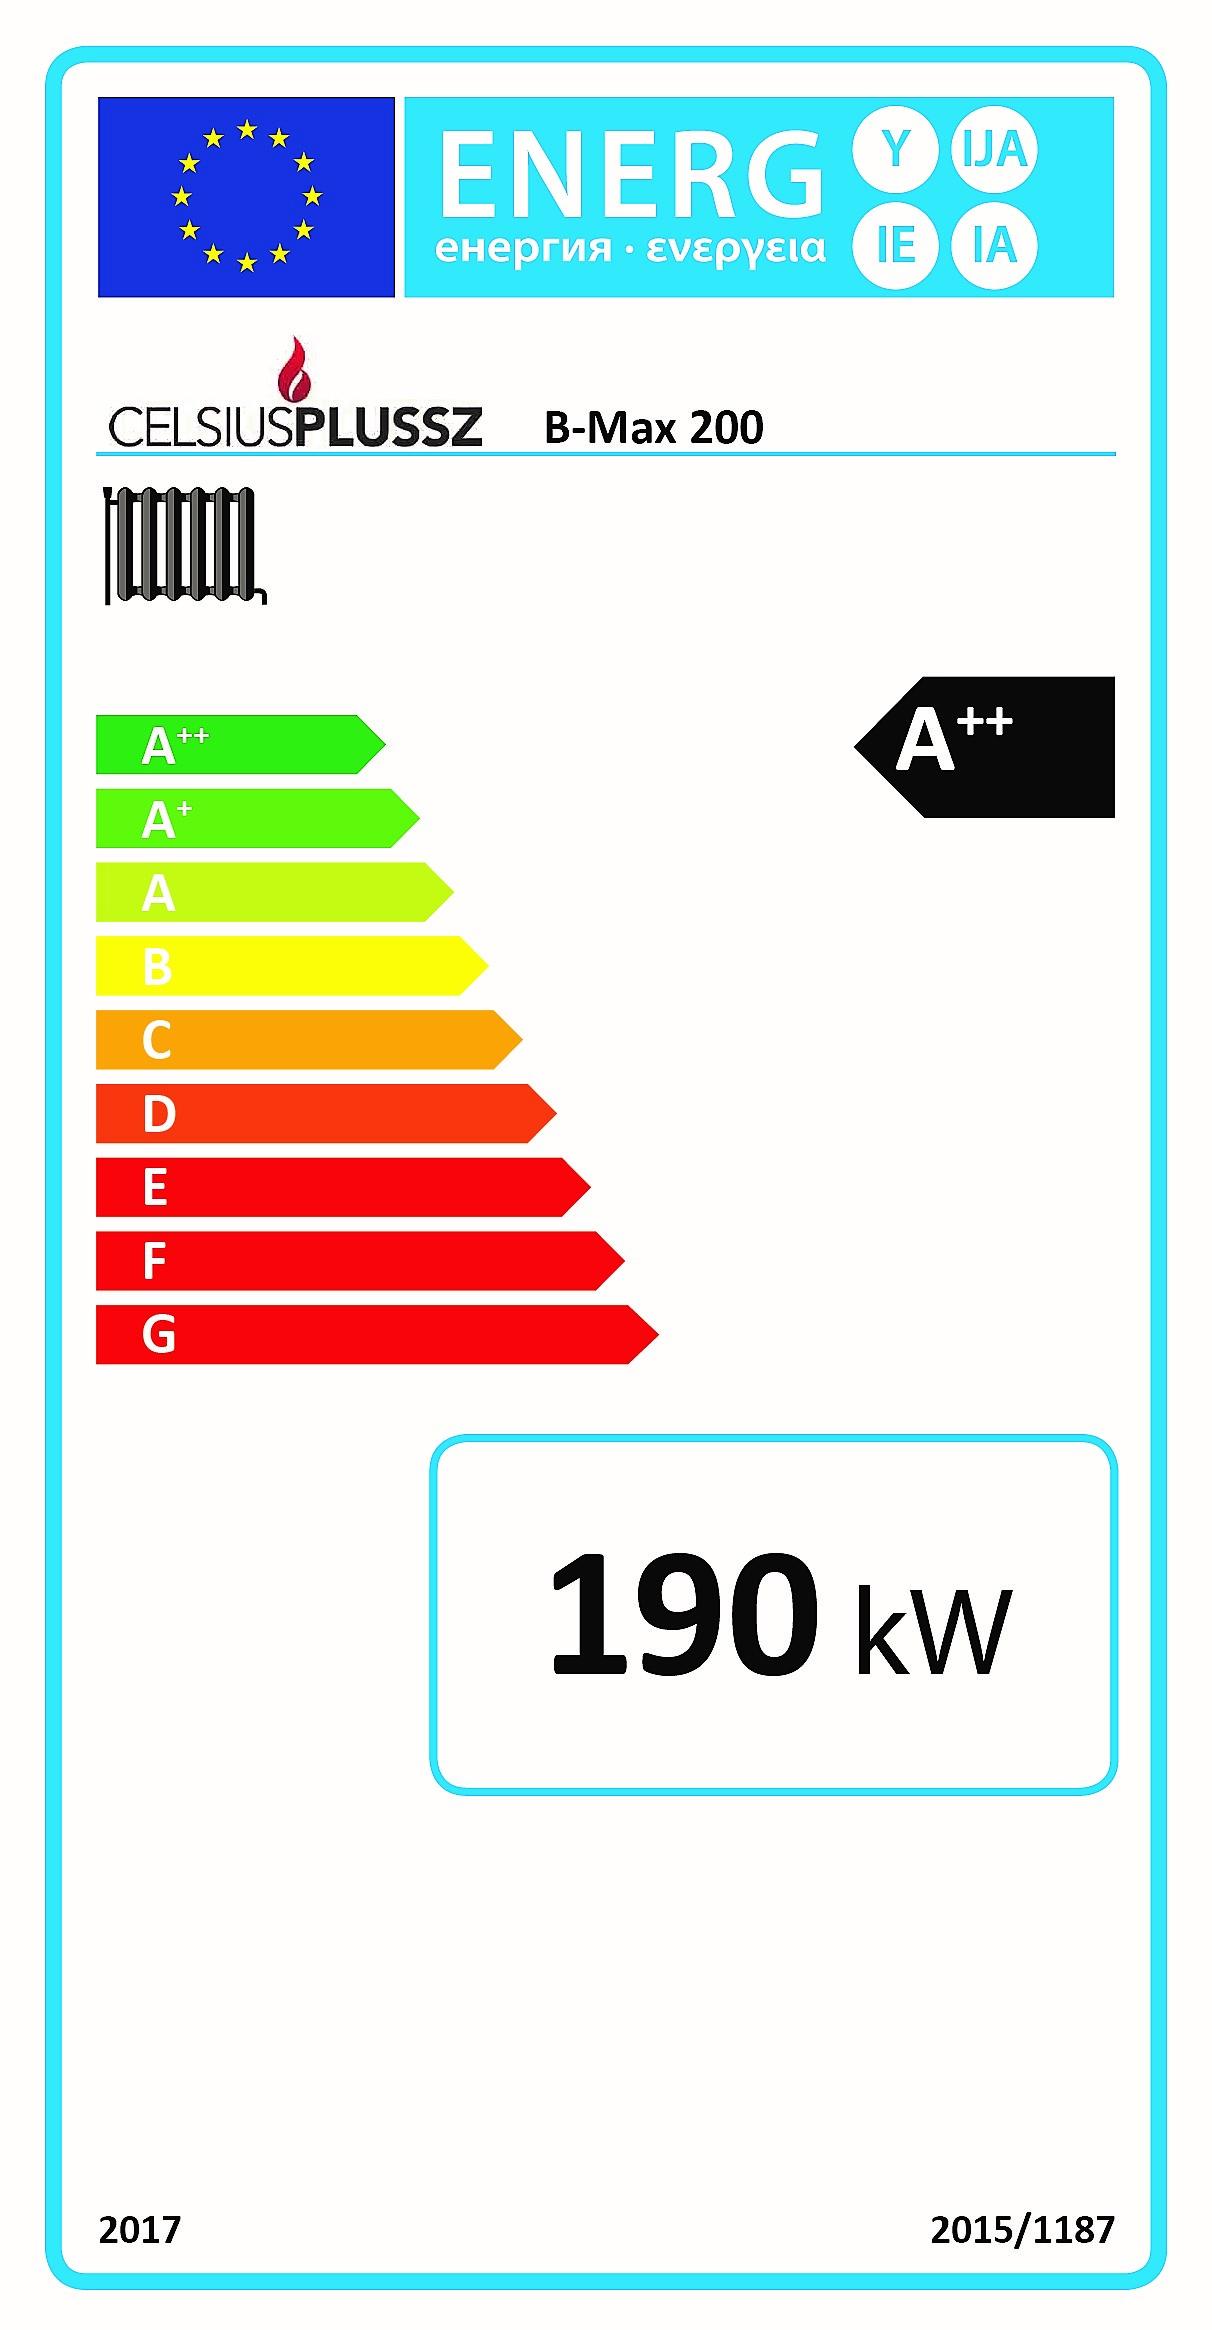 Celsius B-max energiacímke